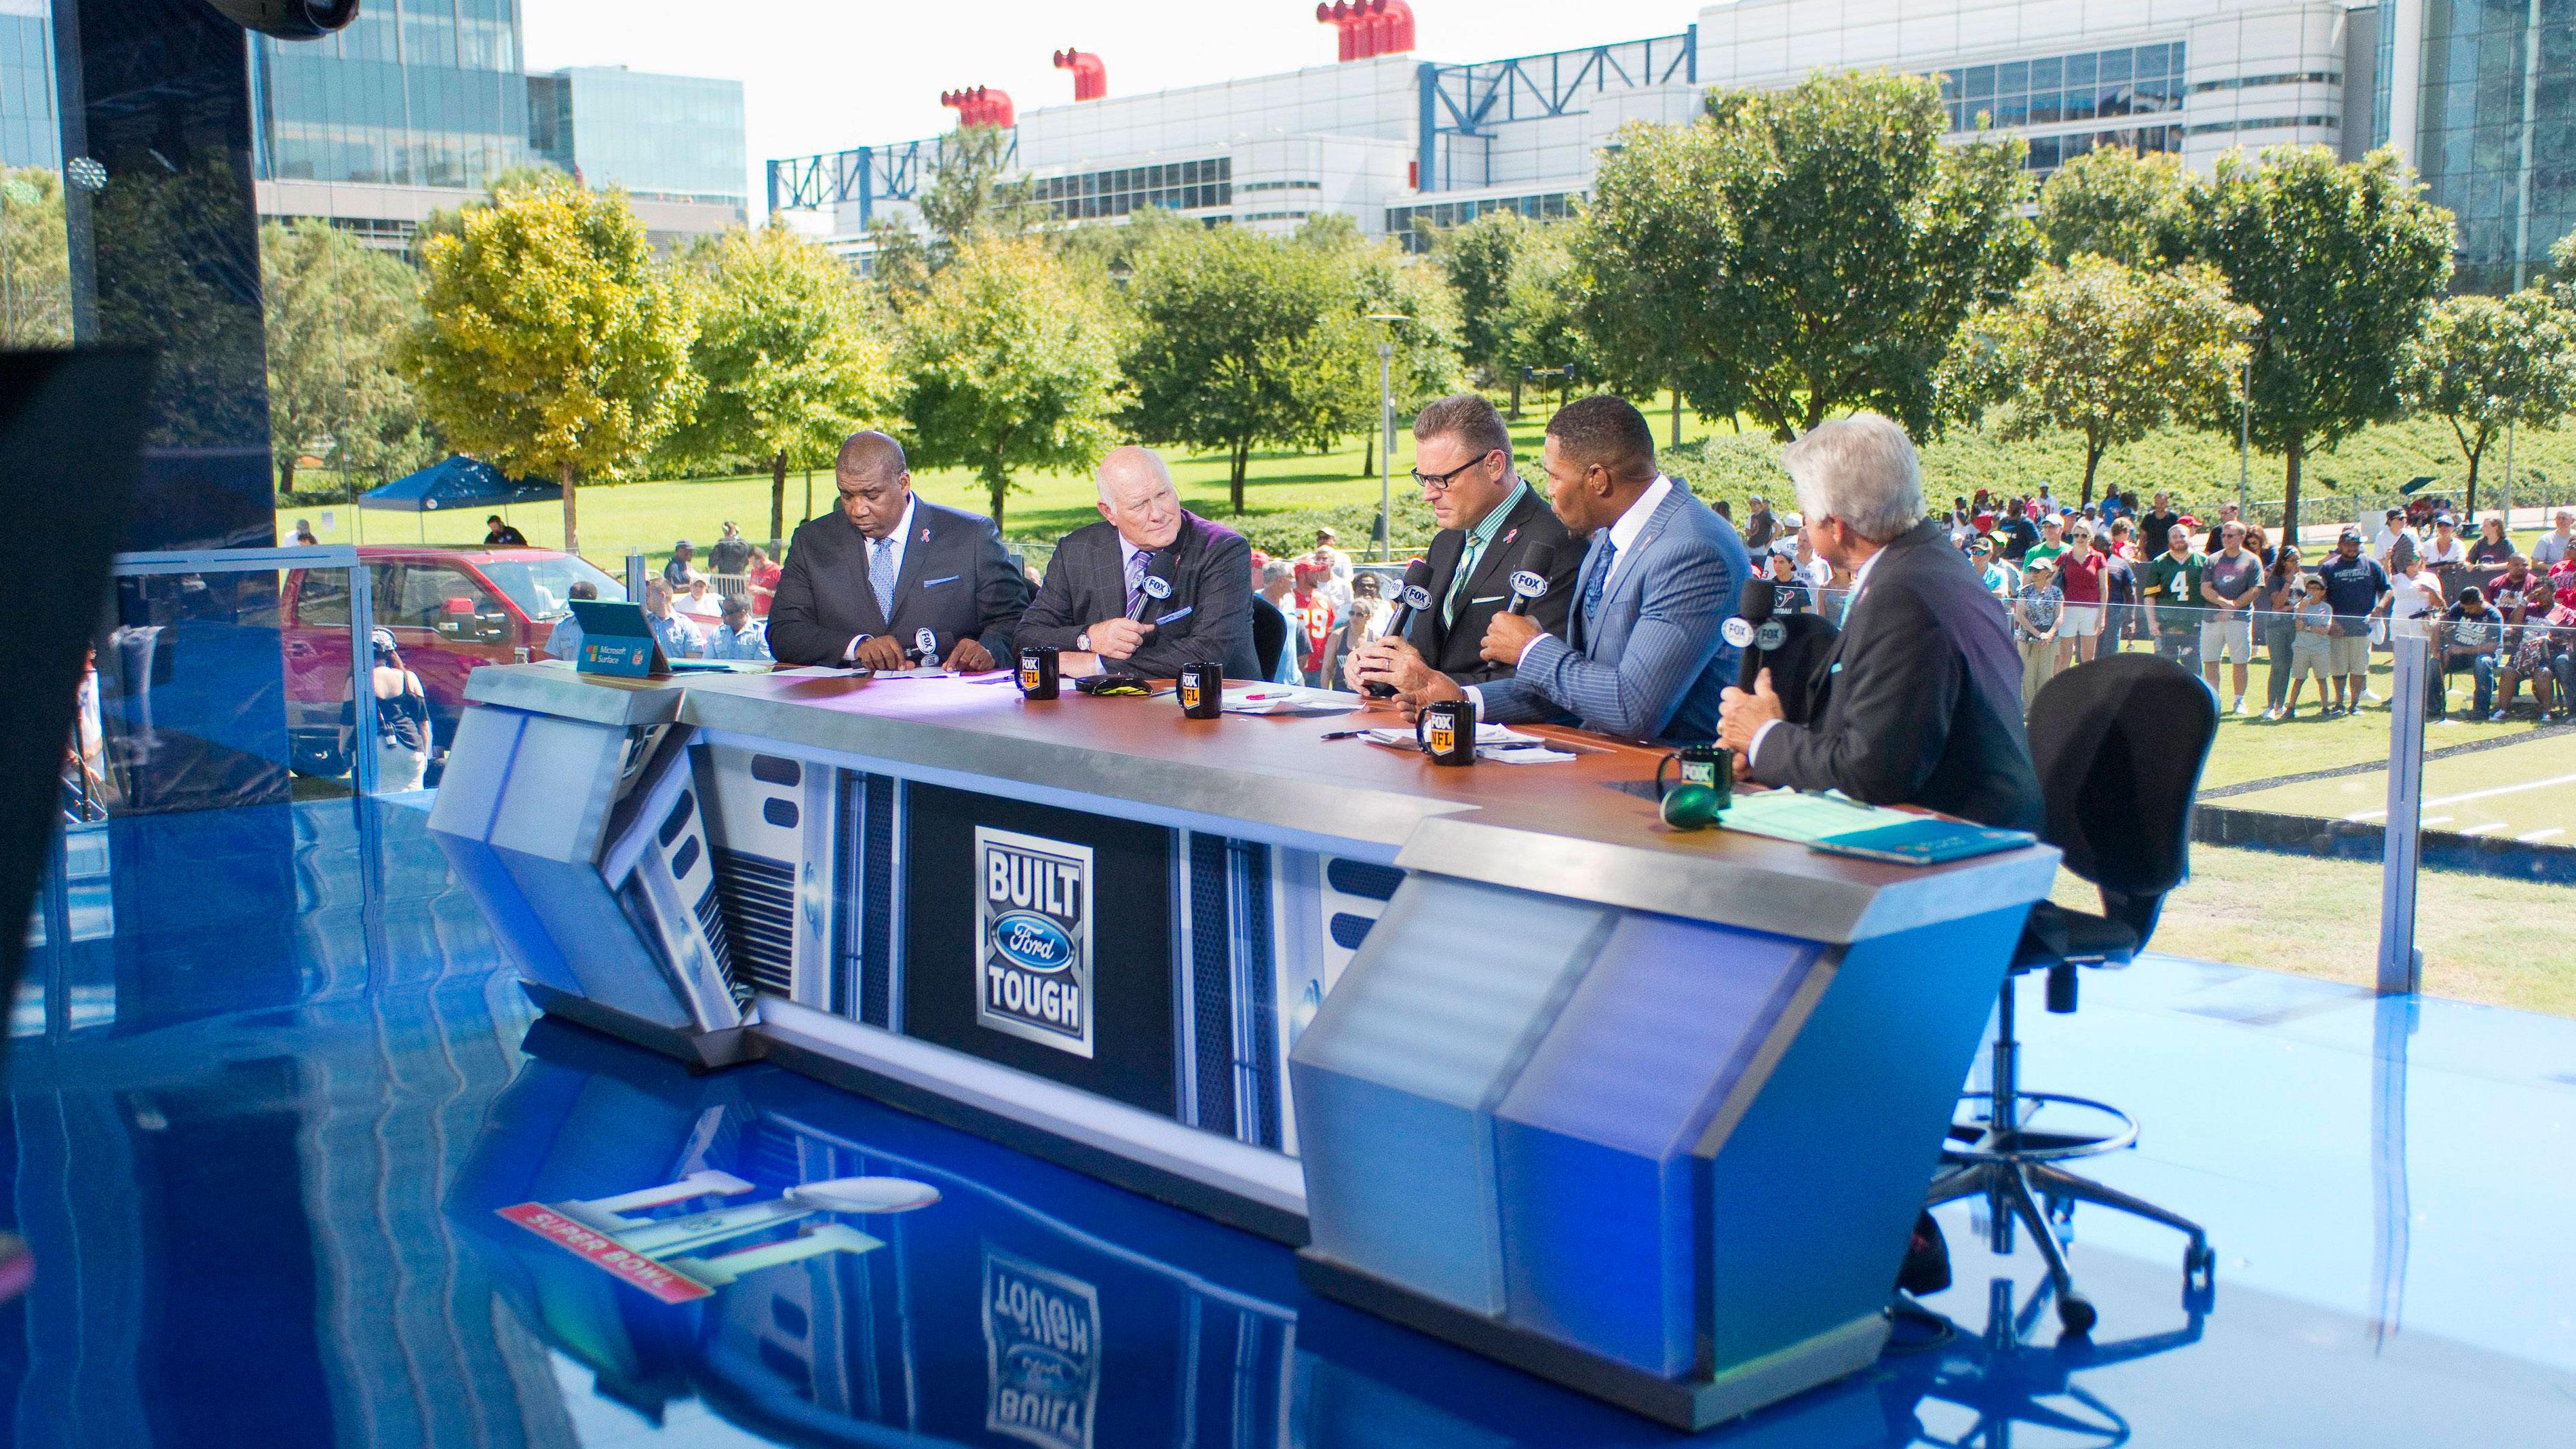 NCS_NFL-Superbowl-Fox-Sports_0037